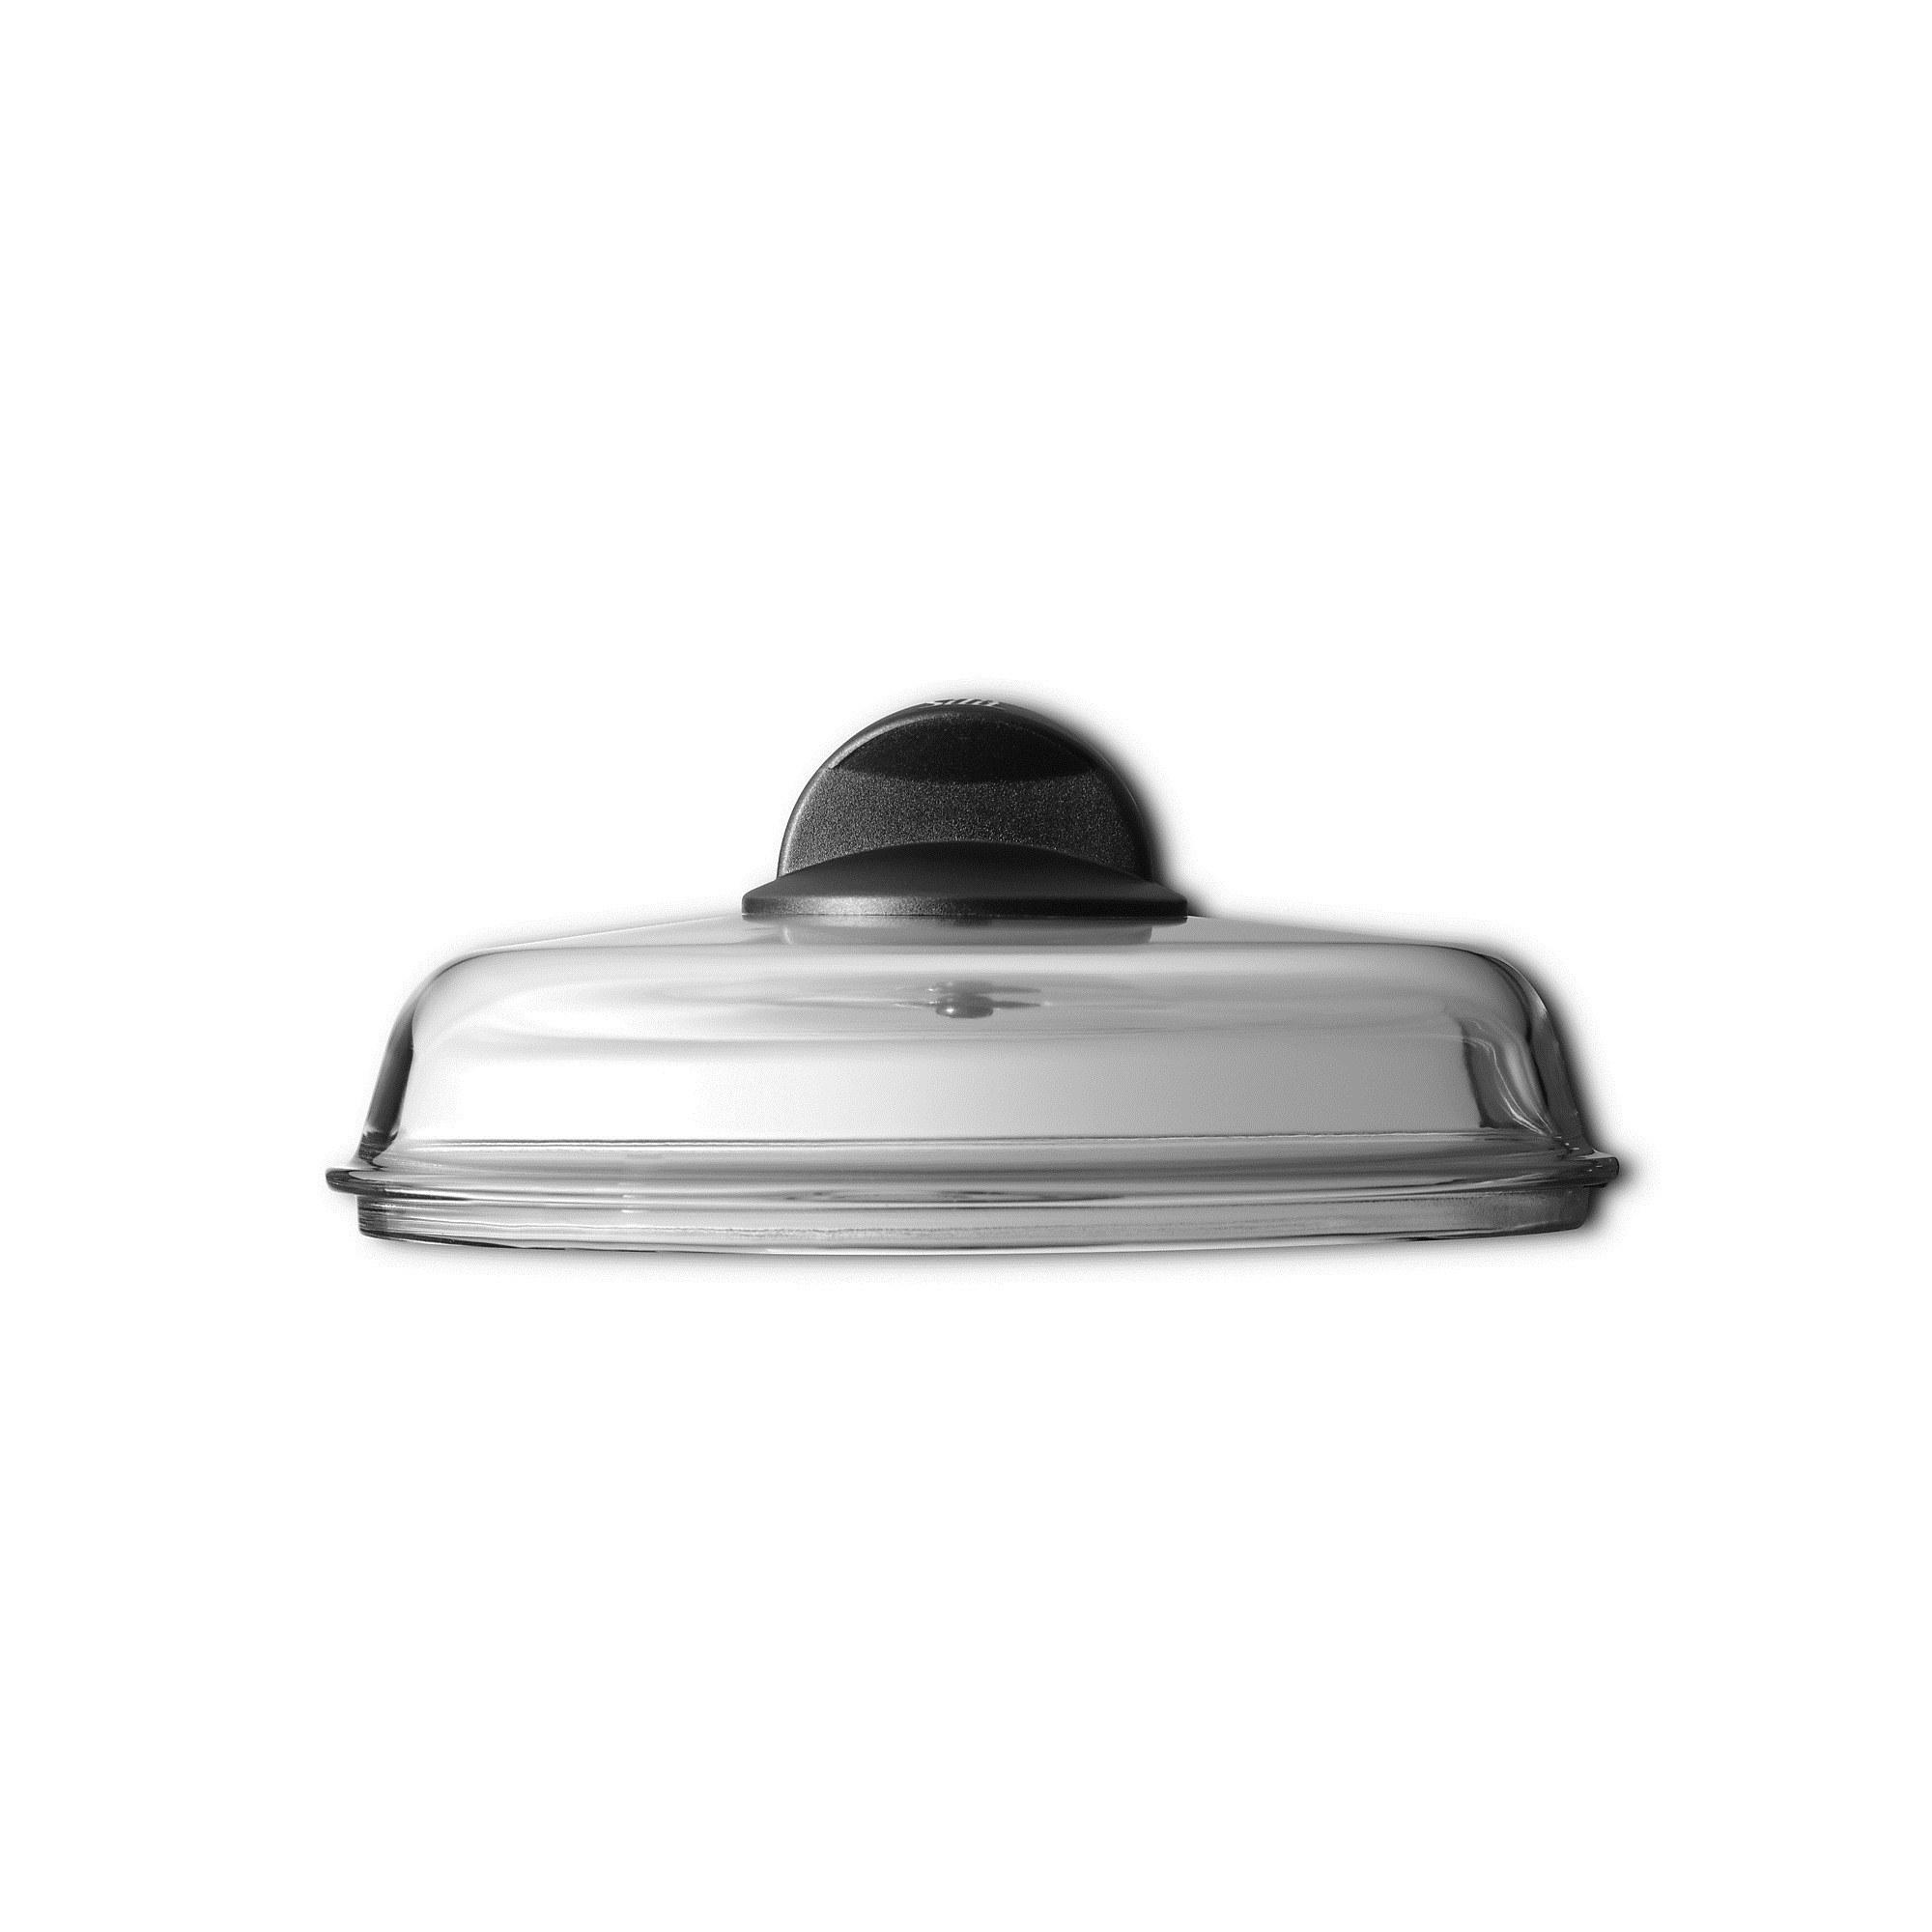 silit glasdeckel f r pfannen 24 cm kunststoffknauf ebay. Black Bedroom Furniture Sets. Home Design Ideas